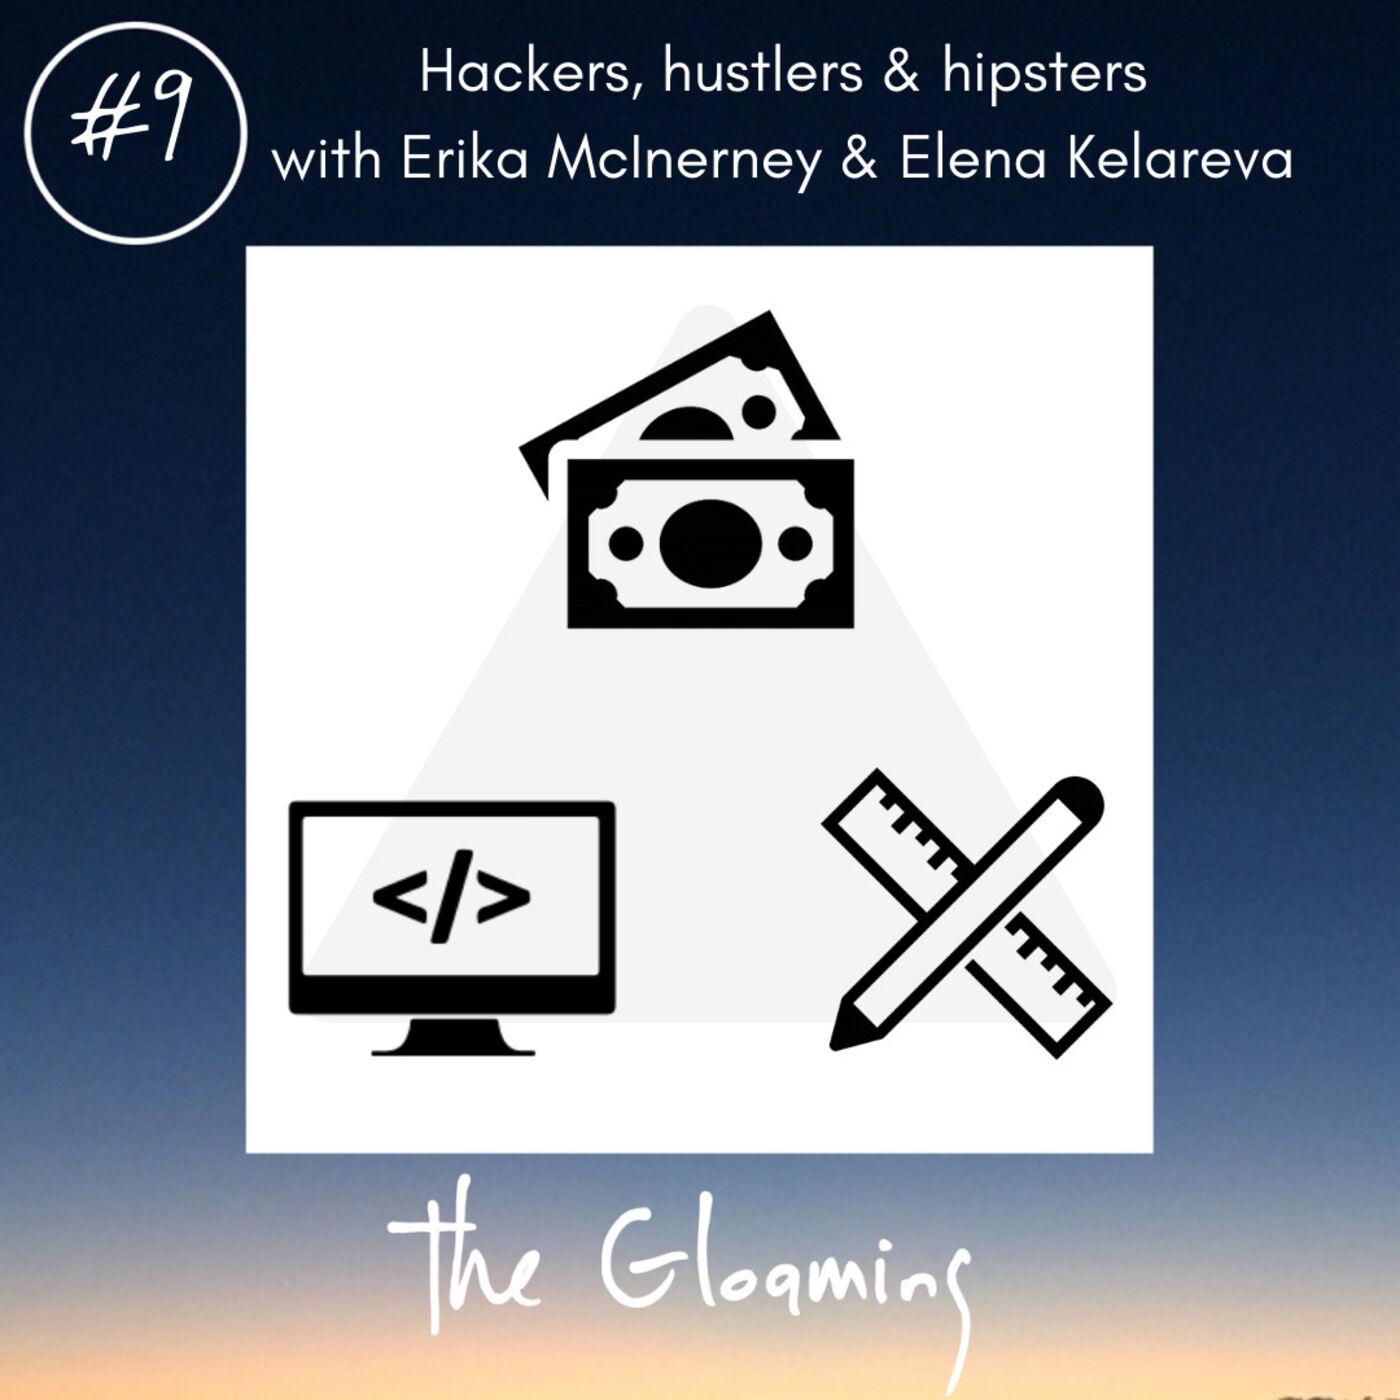 TG9: Hackers, hustlers & hipsters (with Erika McInerney & Elena Kelareva)